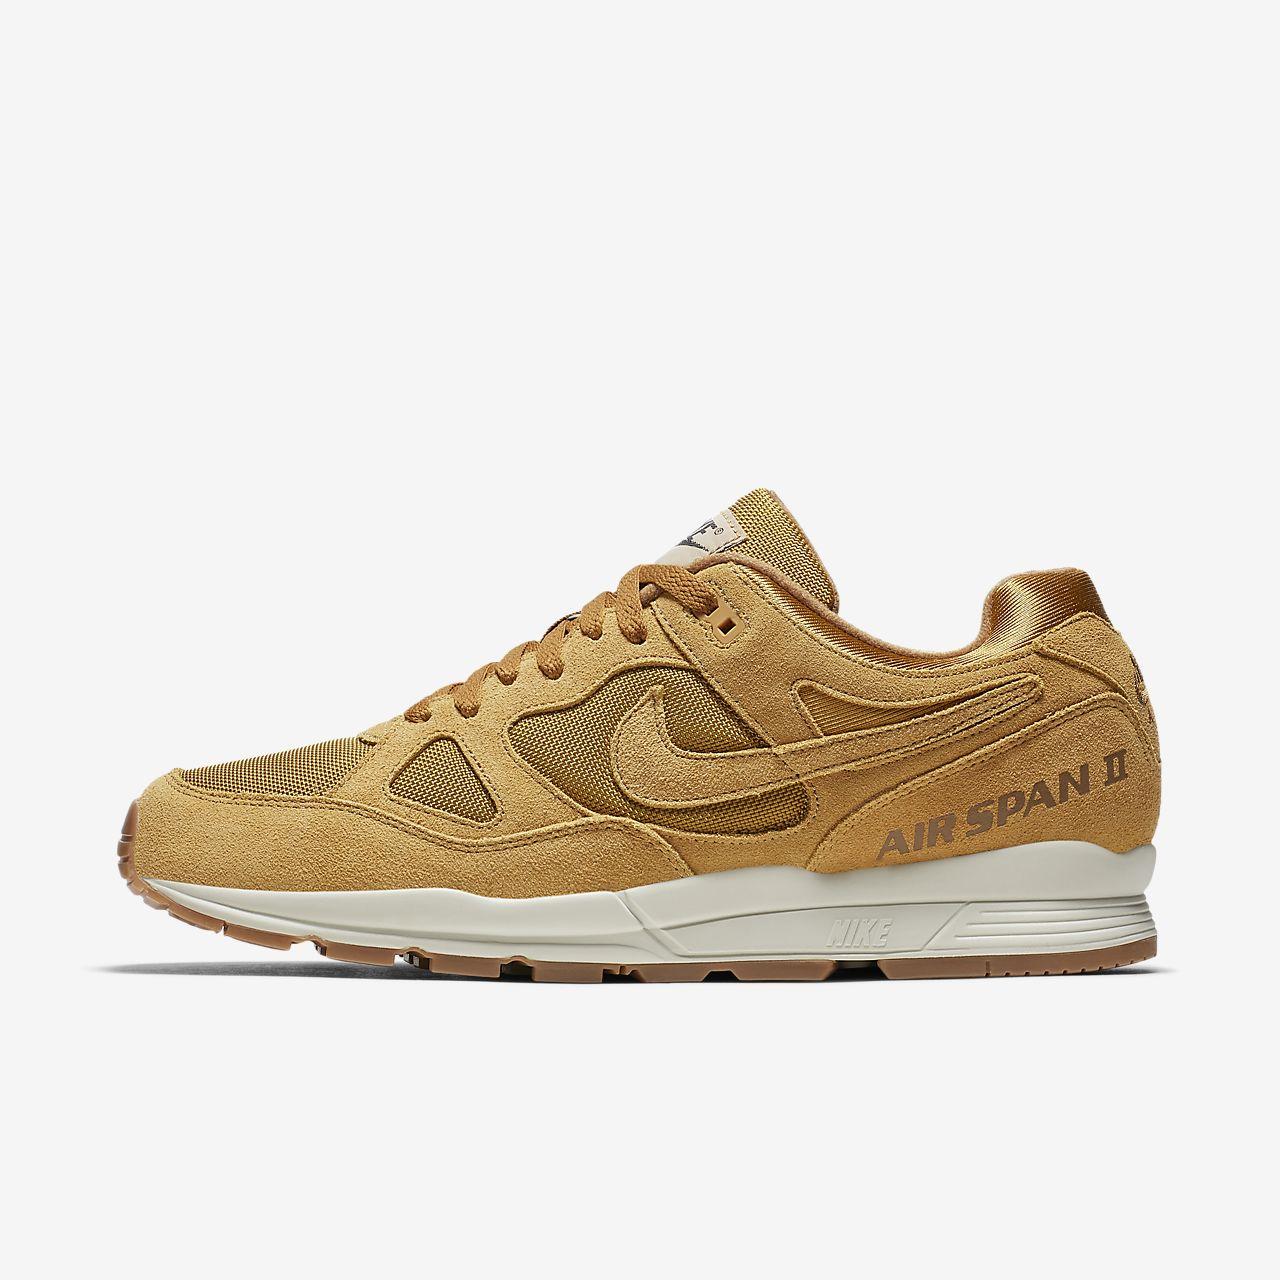 best sneakers 47c1d d6f3e ... Calzado para hombre Nike Air Span II Premium